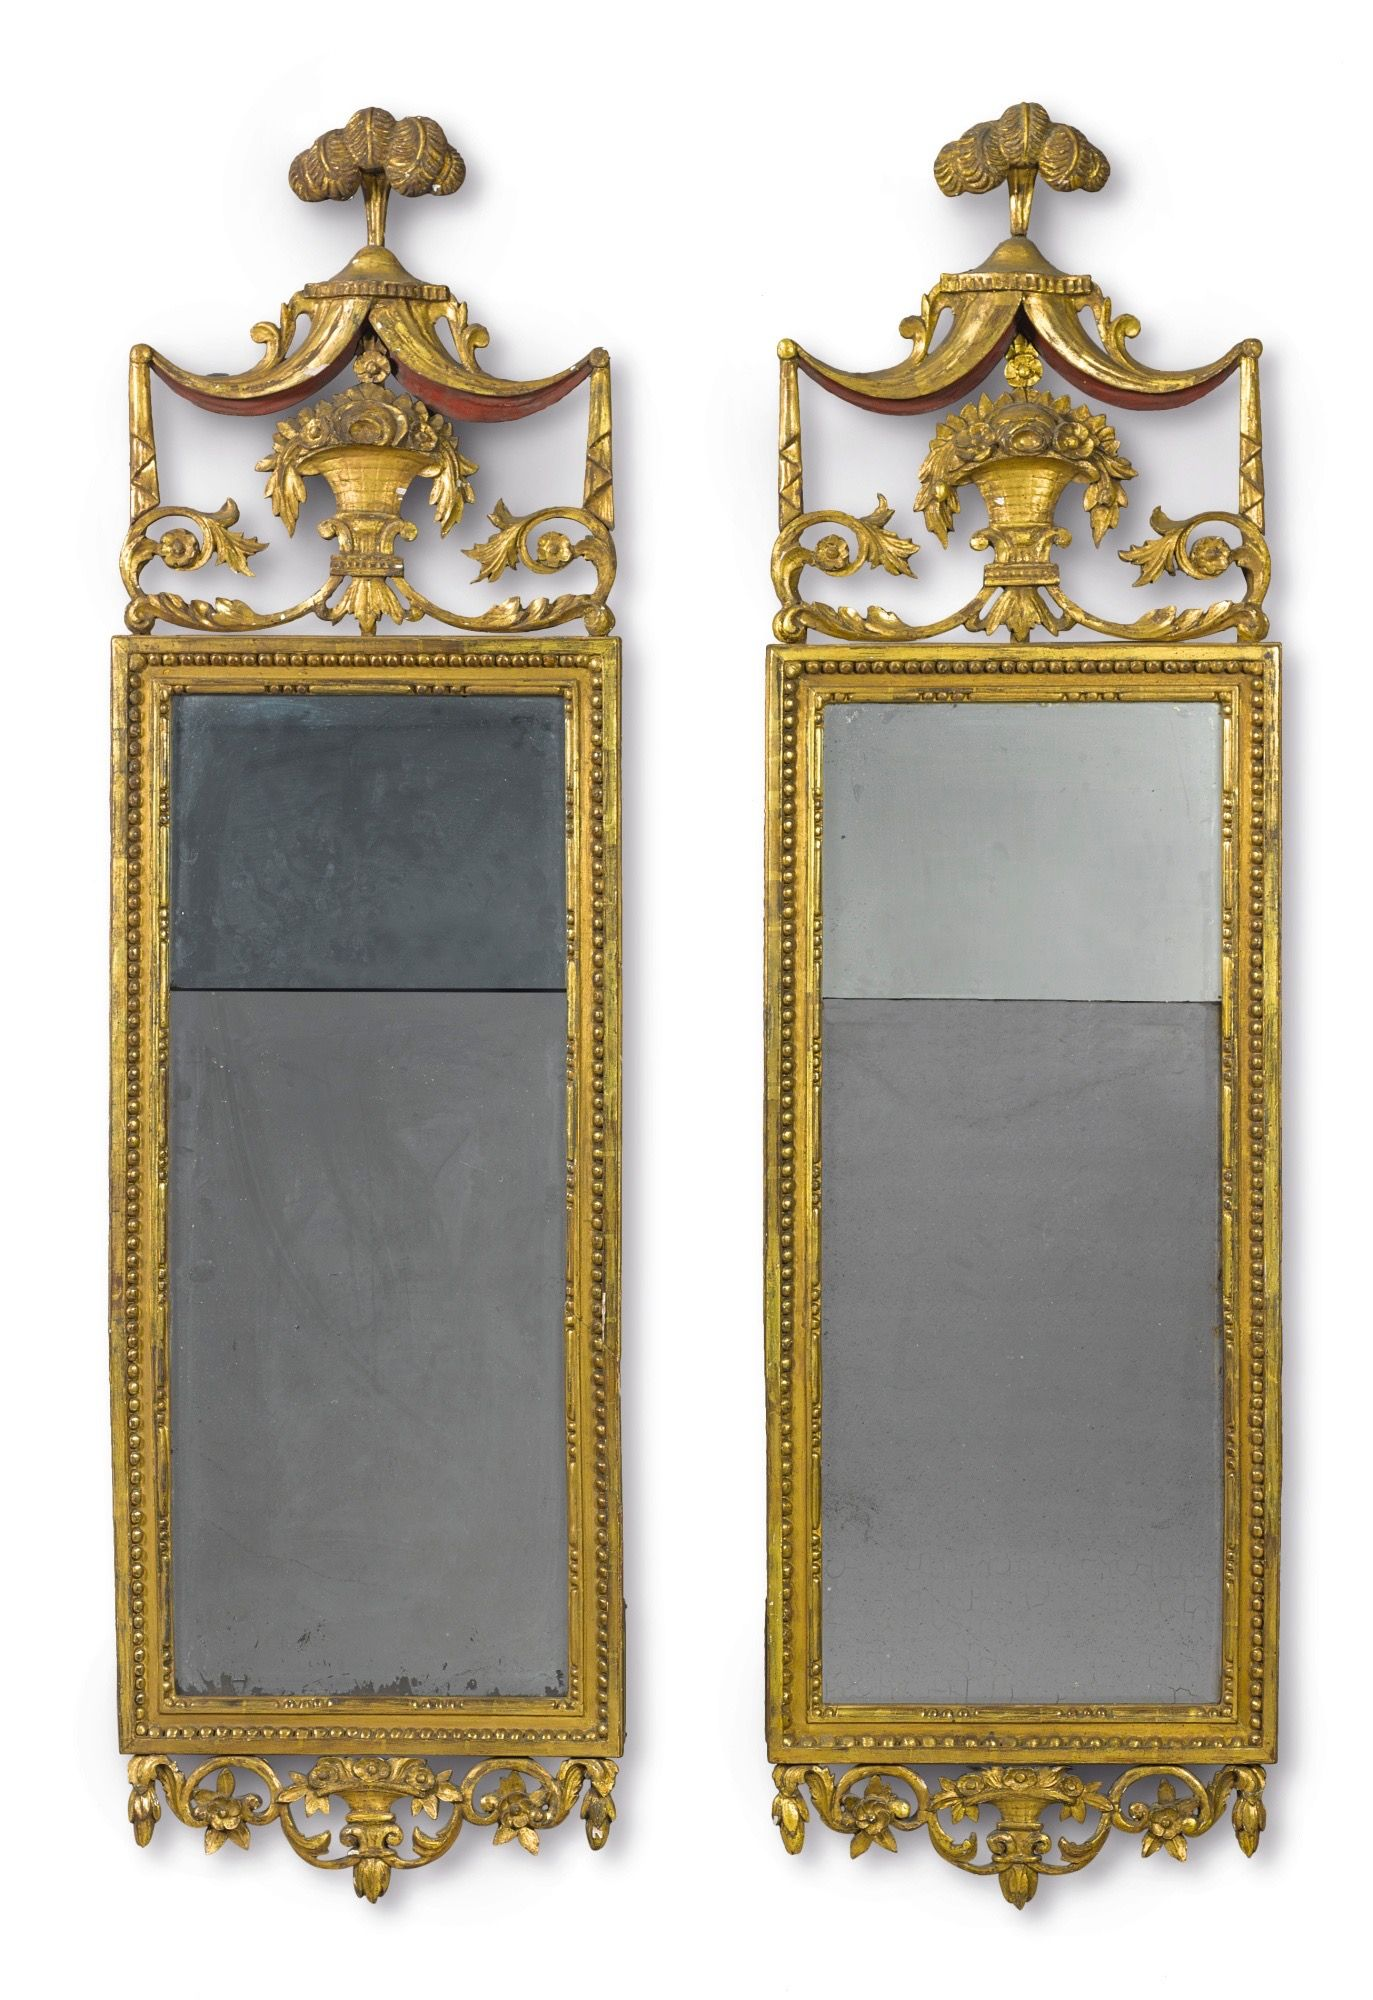 Pin de Elena Bortnikova en Louis XVI Neoclassical picture/mirror ...